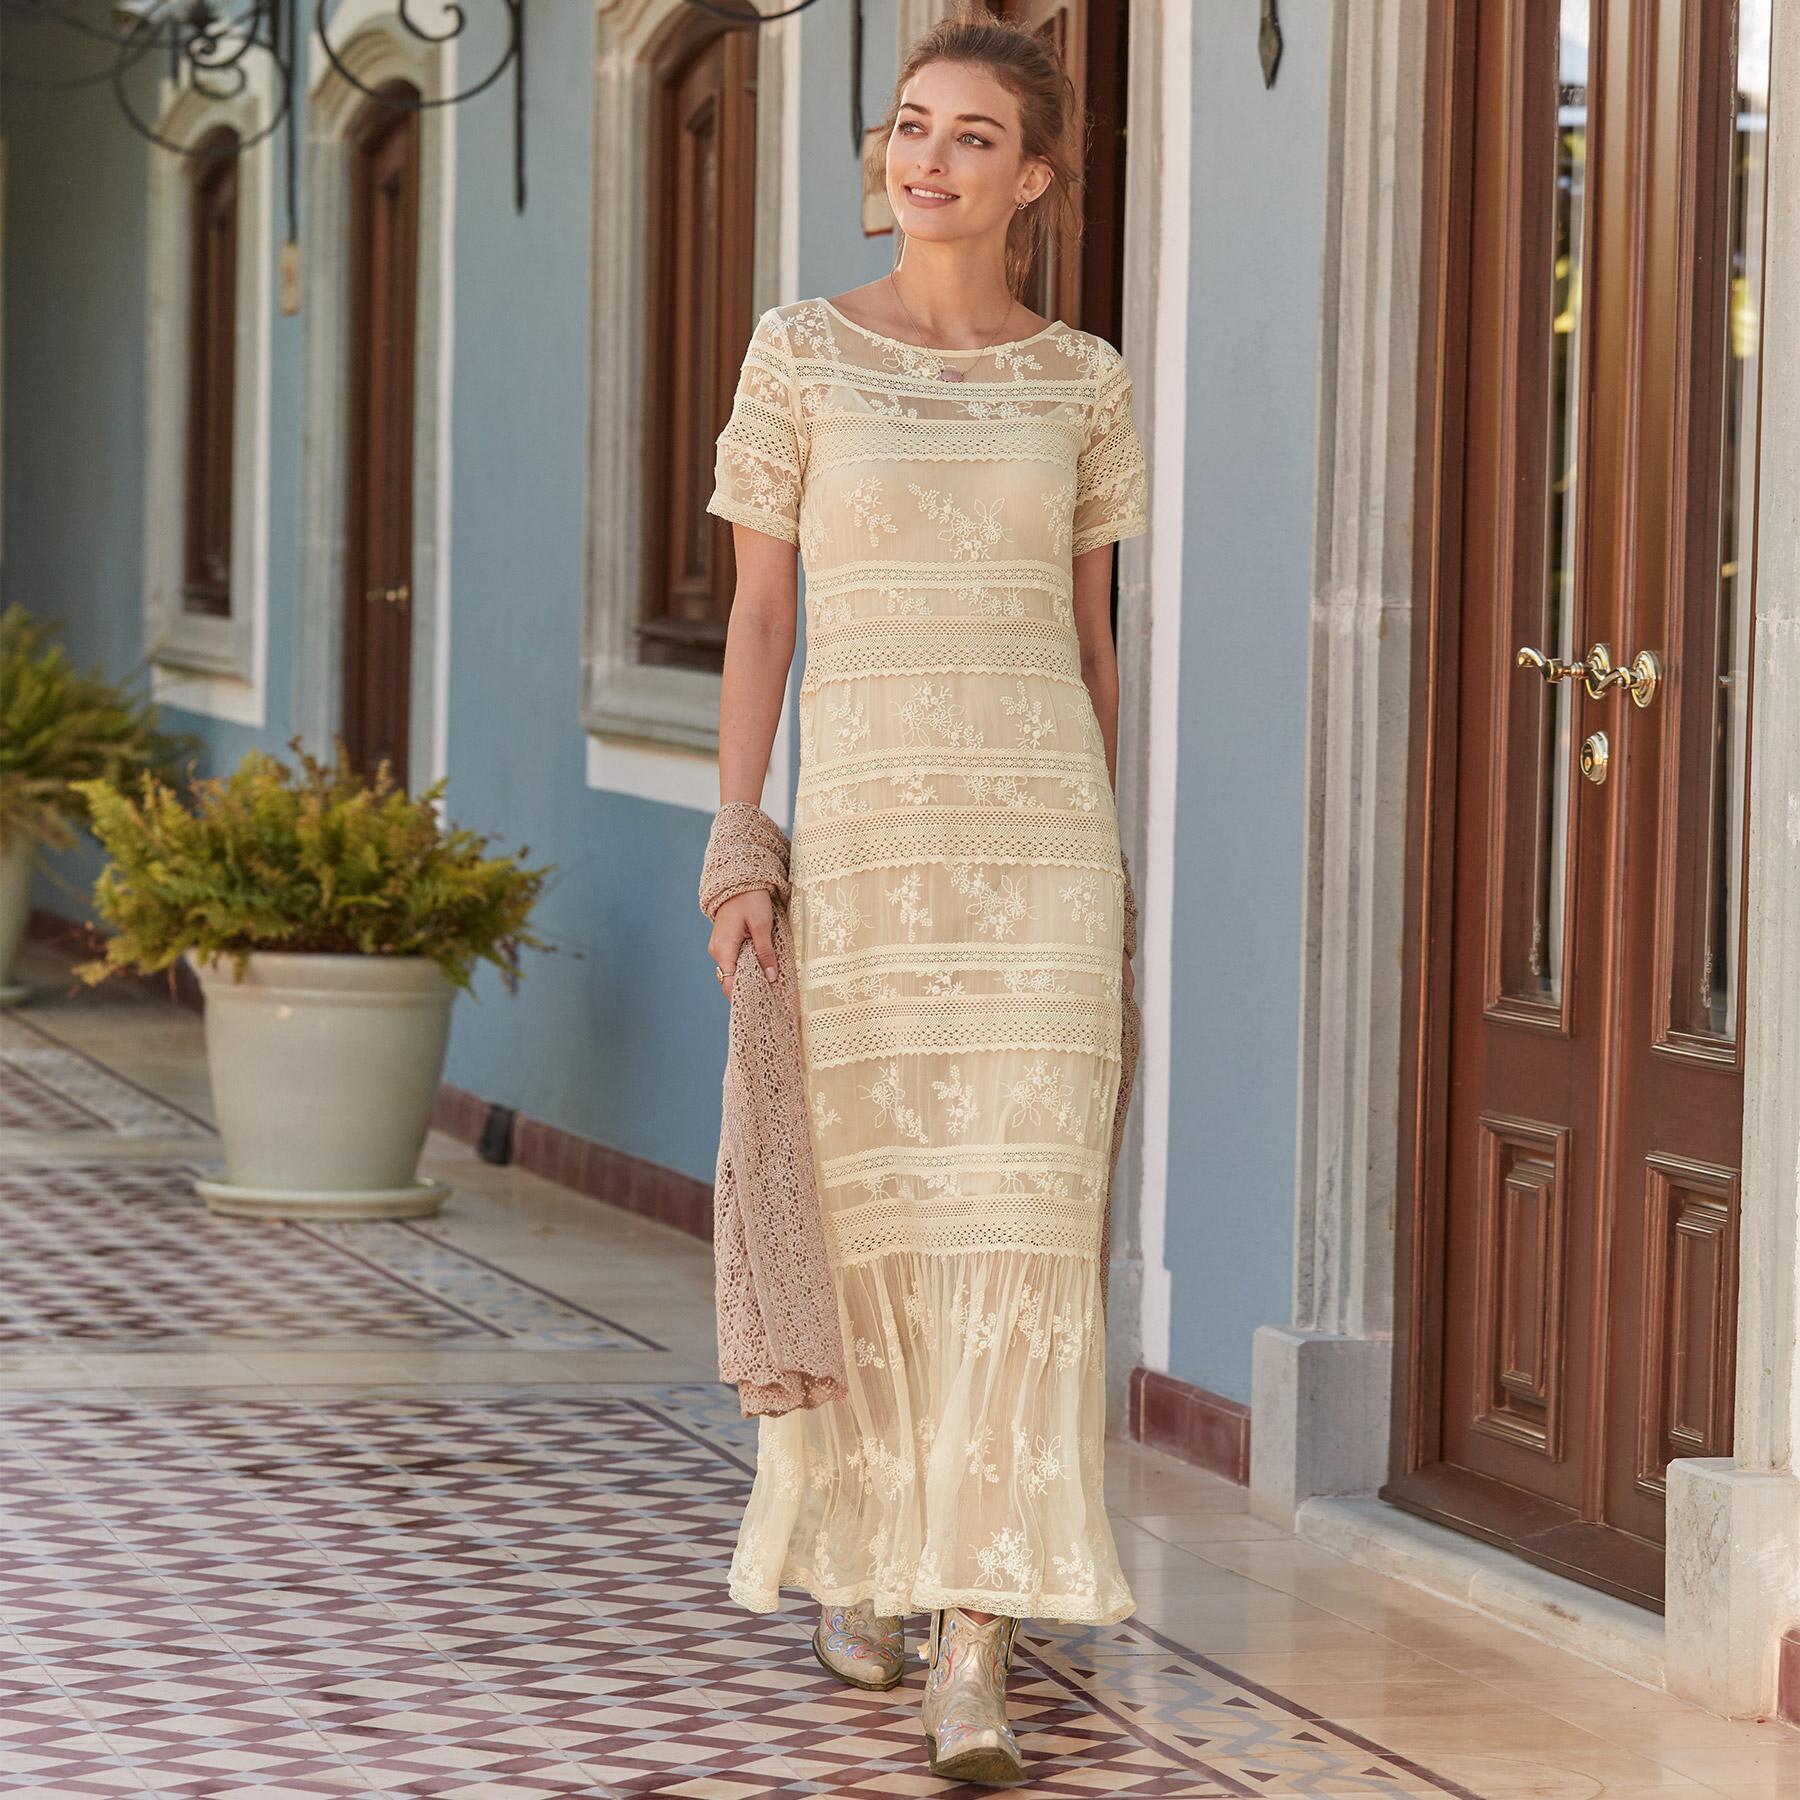 LOVE AFFAIR DRESS - PETITES: View 2